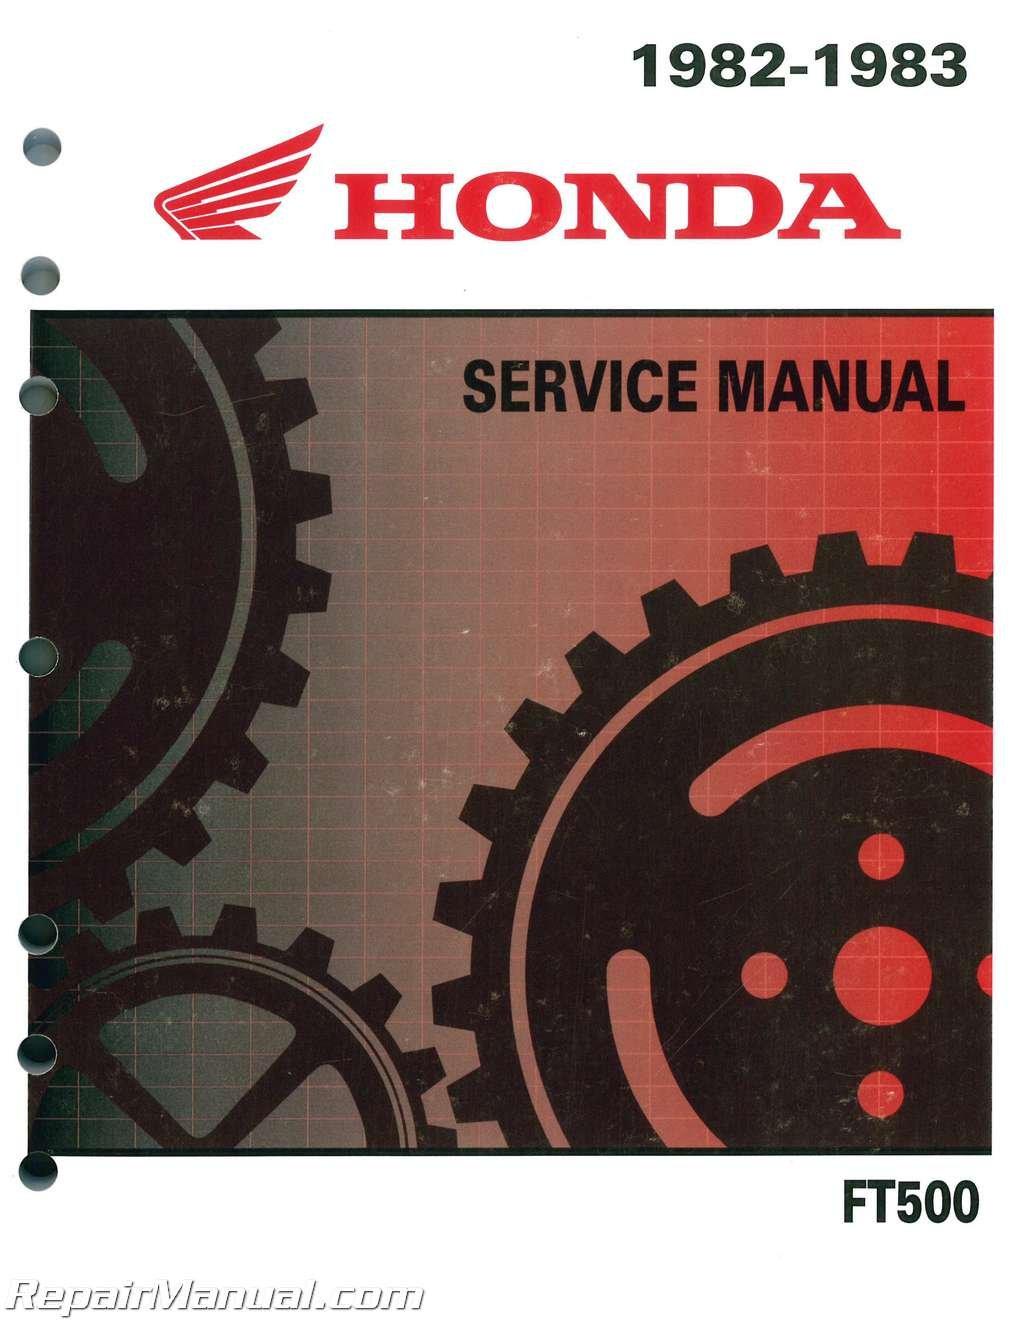 61MC801 1982 - 1983 Honda FT500 ASCOT Motorcycle Service Manual: by Author:  Amazon.com: BooksAmazon.com